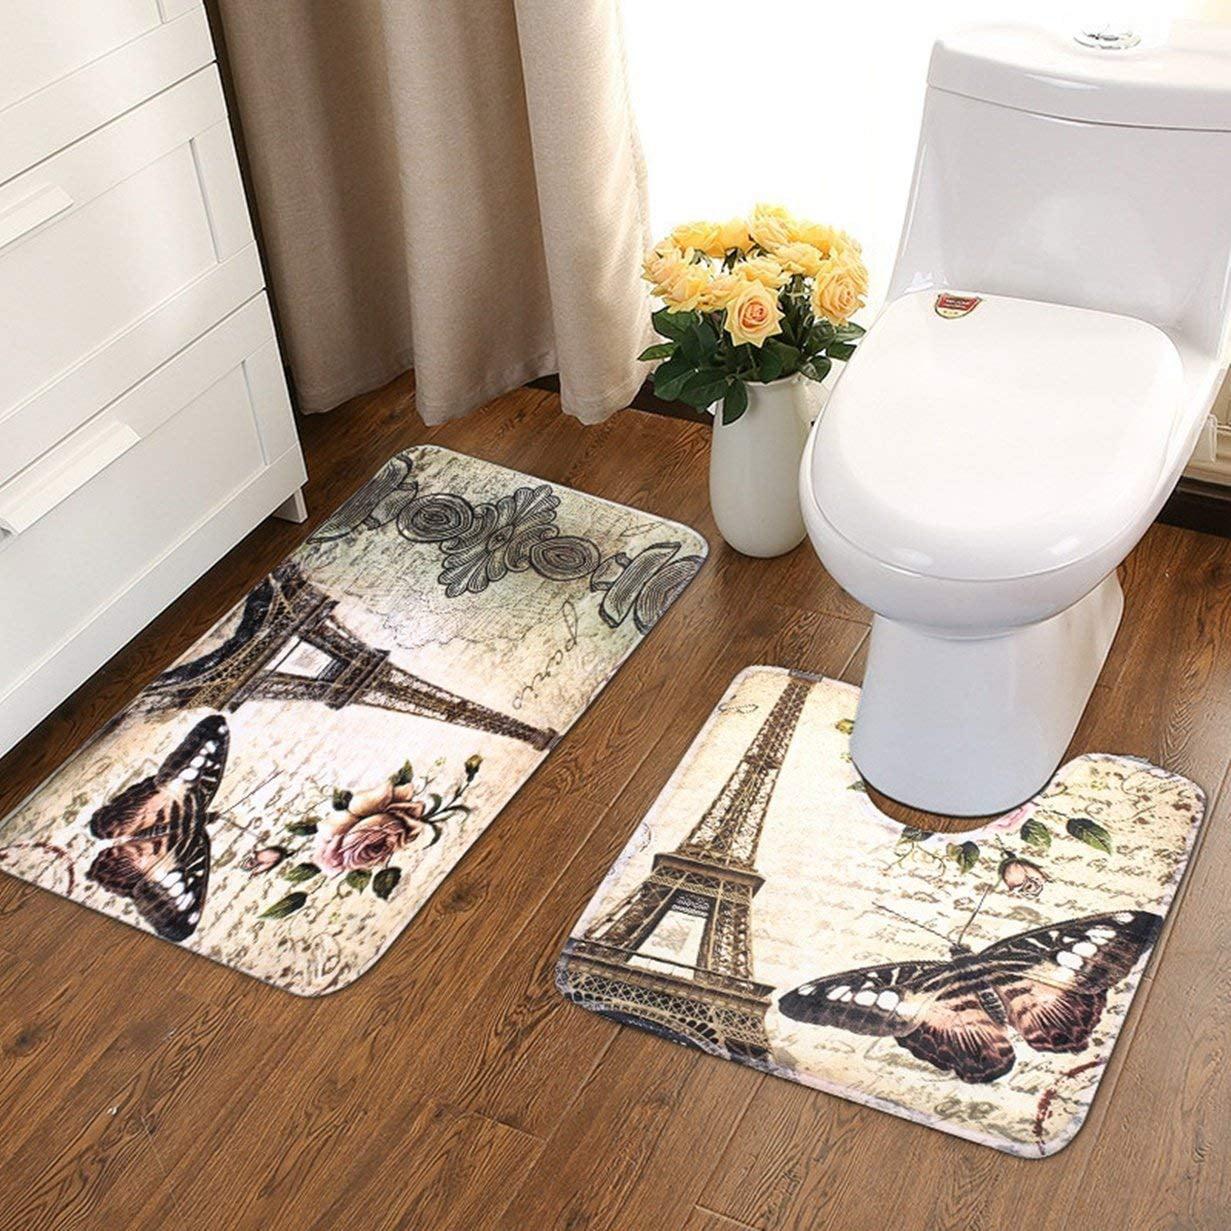 2 Piece Flannel Bathroom Rug Set, Eiffel Tower Design Shower Mat And ...